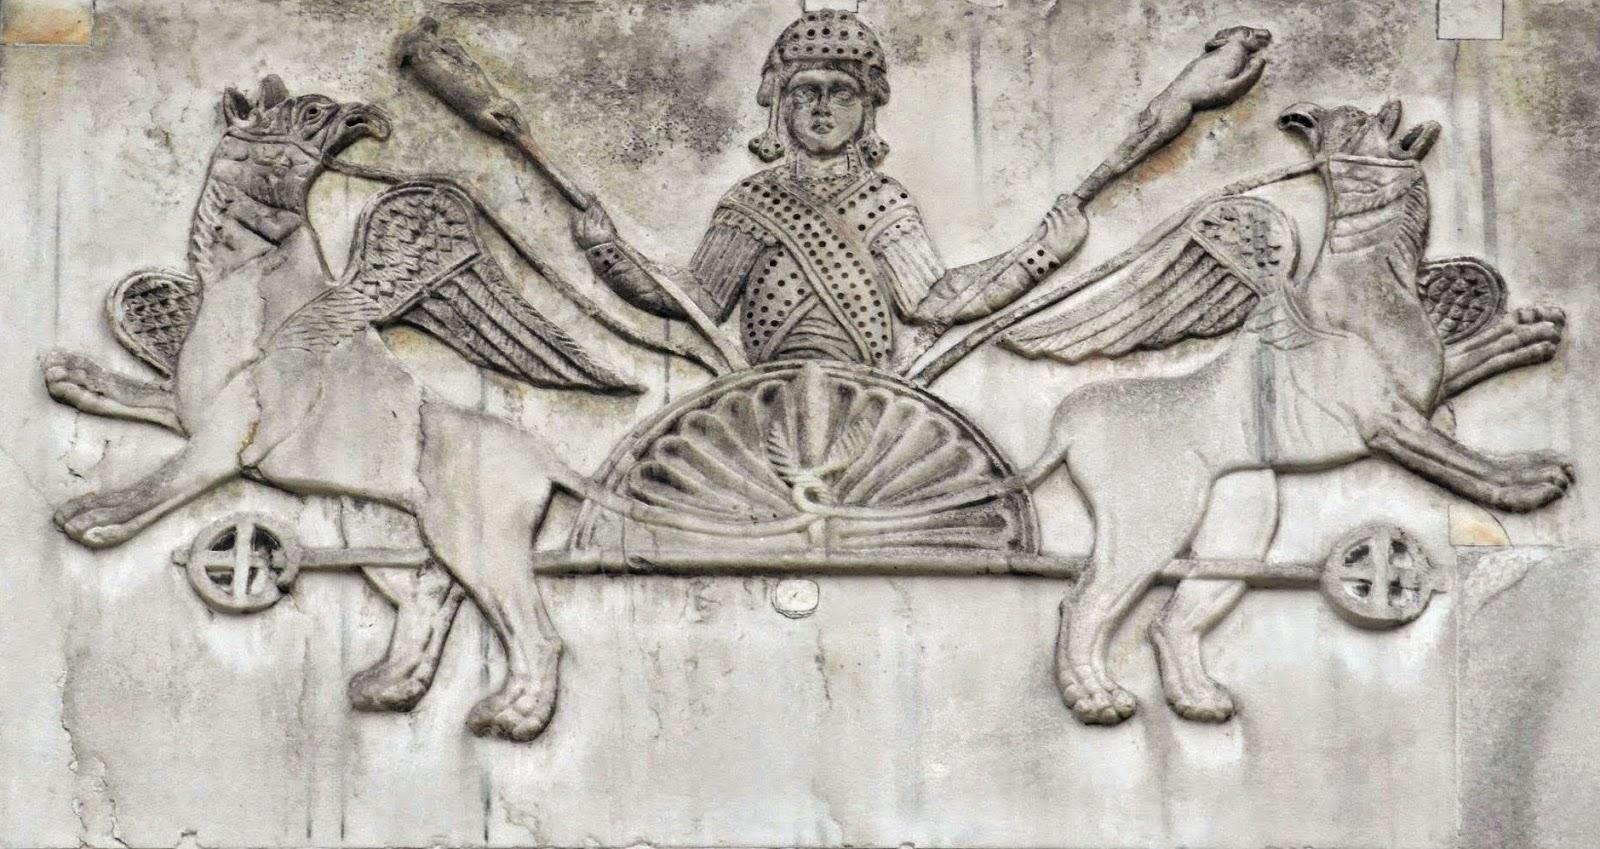 Bas-Relief of Alexander the Great, Basilica San Marco, Venice